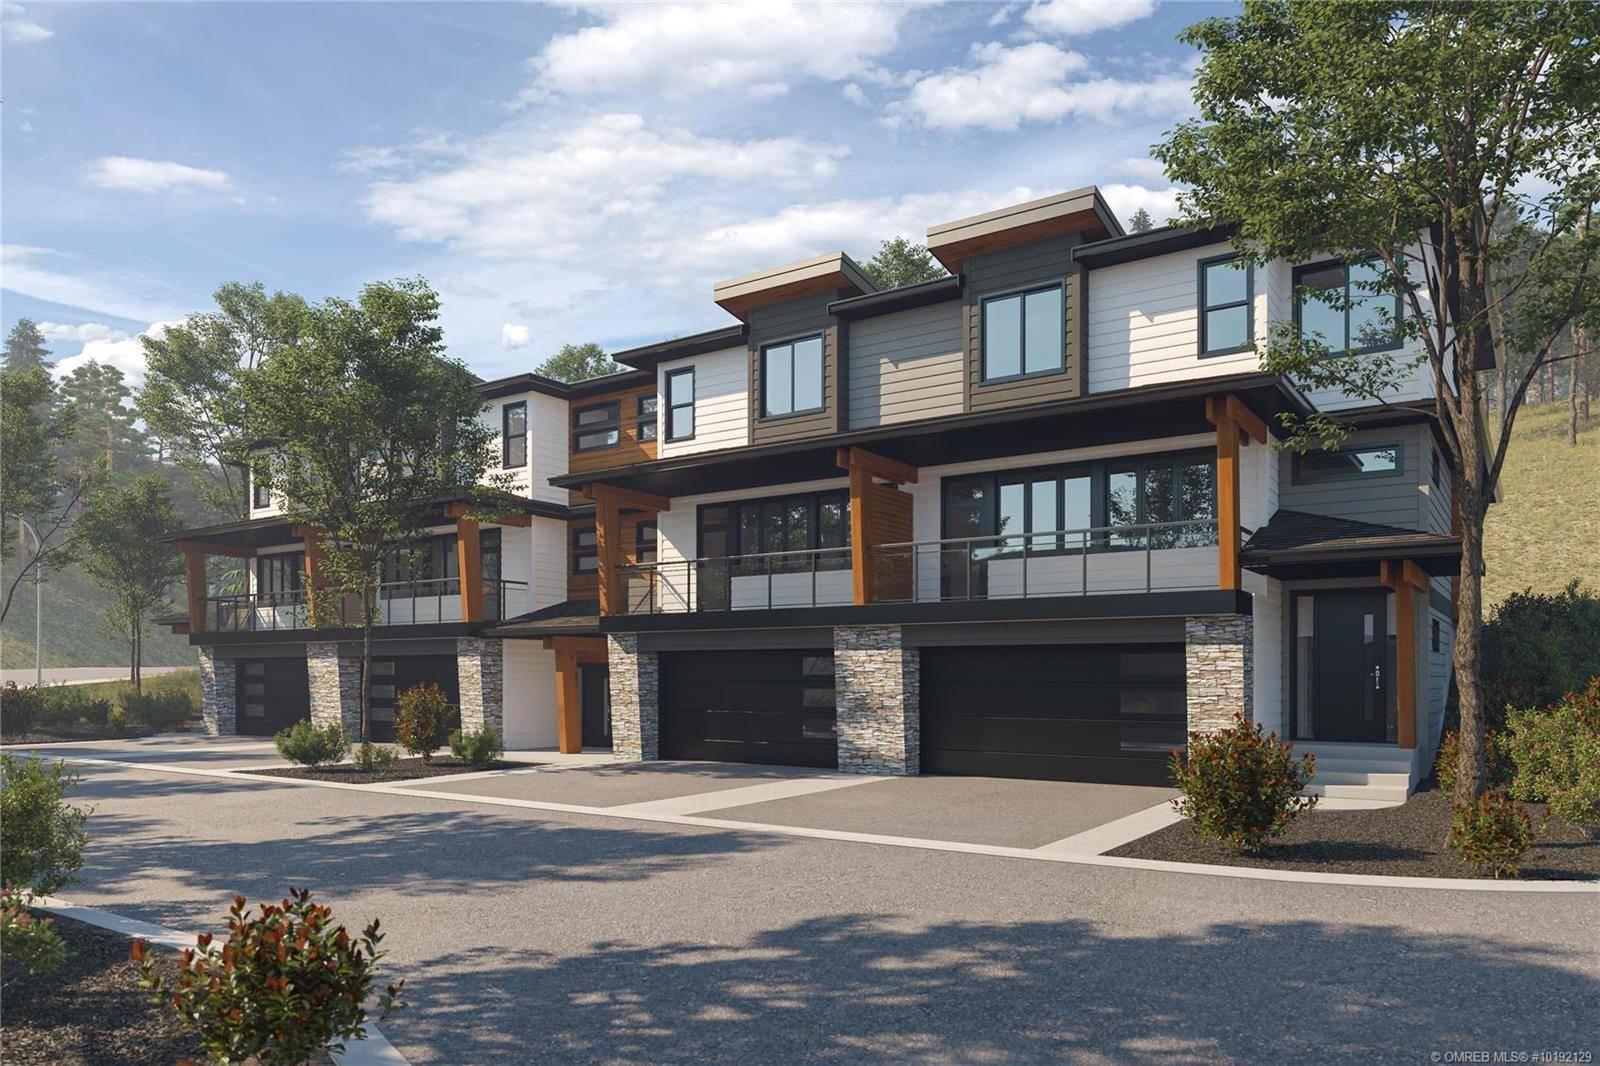 Townhouse for sale at 2575 Eagle Ridge Dr Unit 2 West Kelowna British Columbia - MLS: 10192129